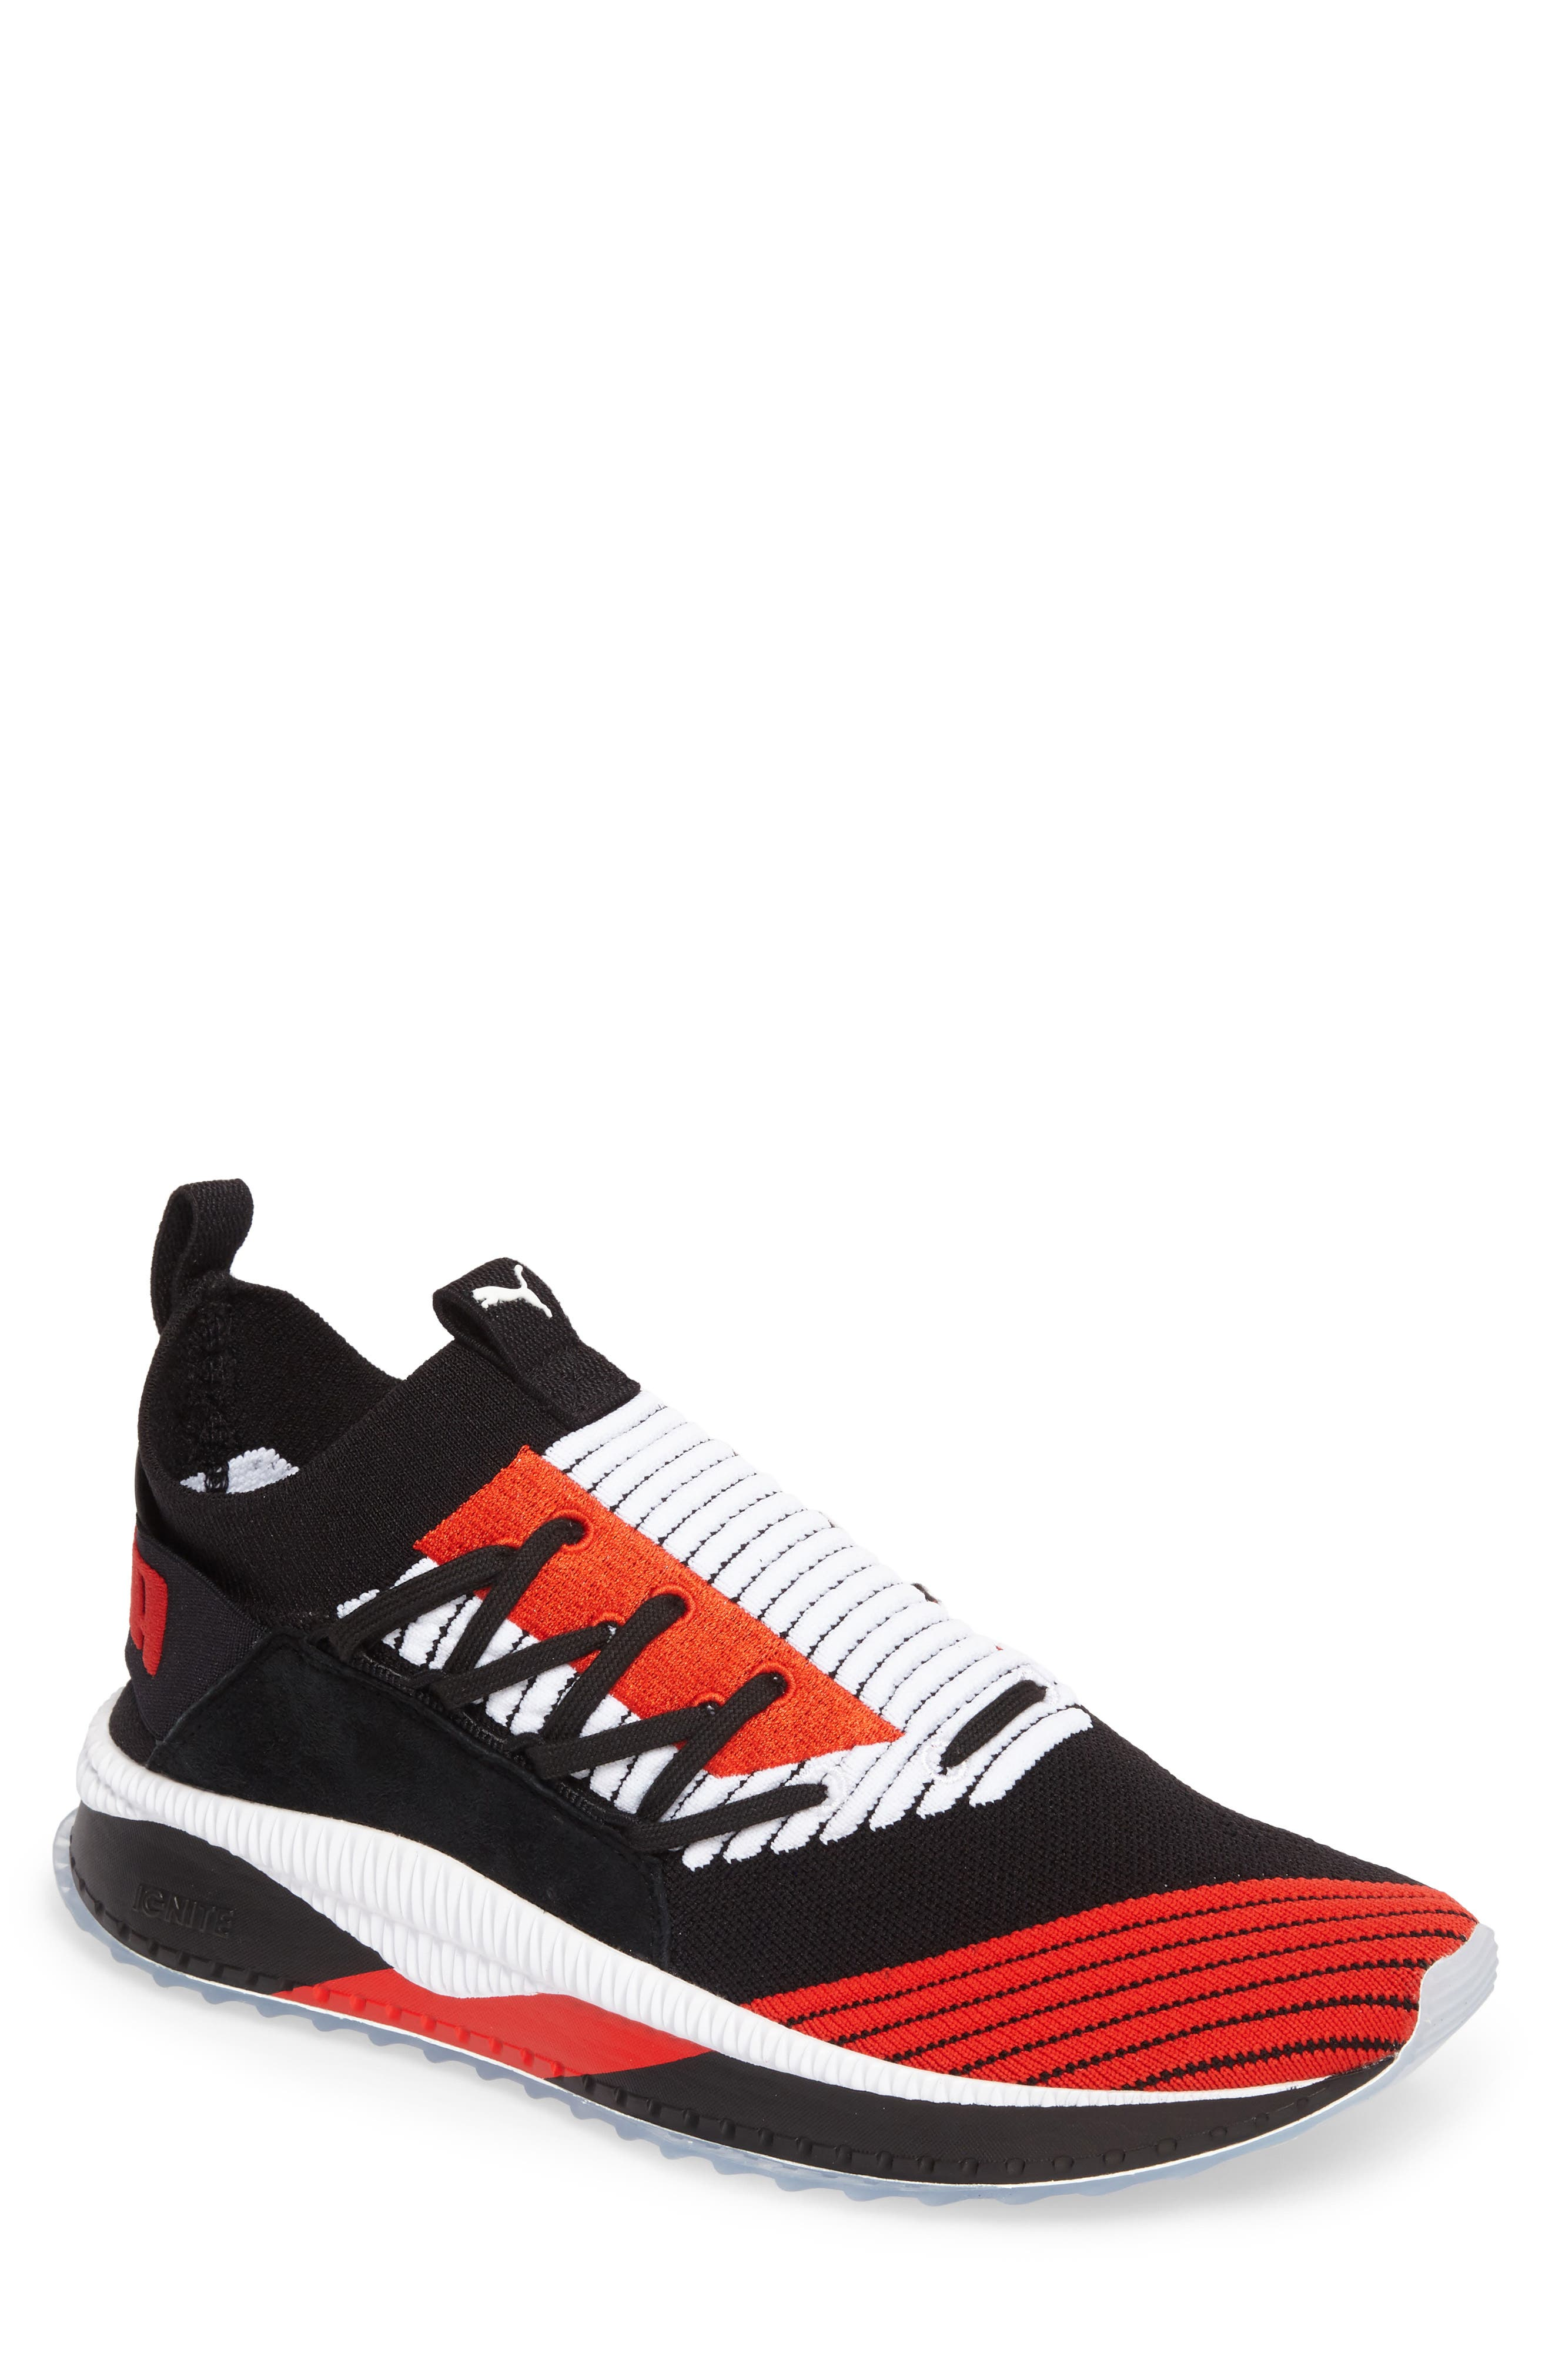 Tsugi Shinsei UT Odyssey Sneaker,                             Main thumbnail 1, color,                             Black/White/Flame Scarlet